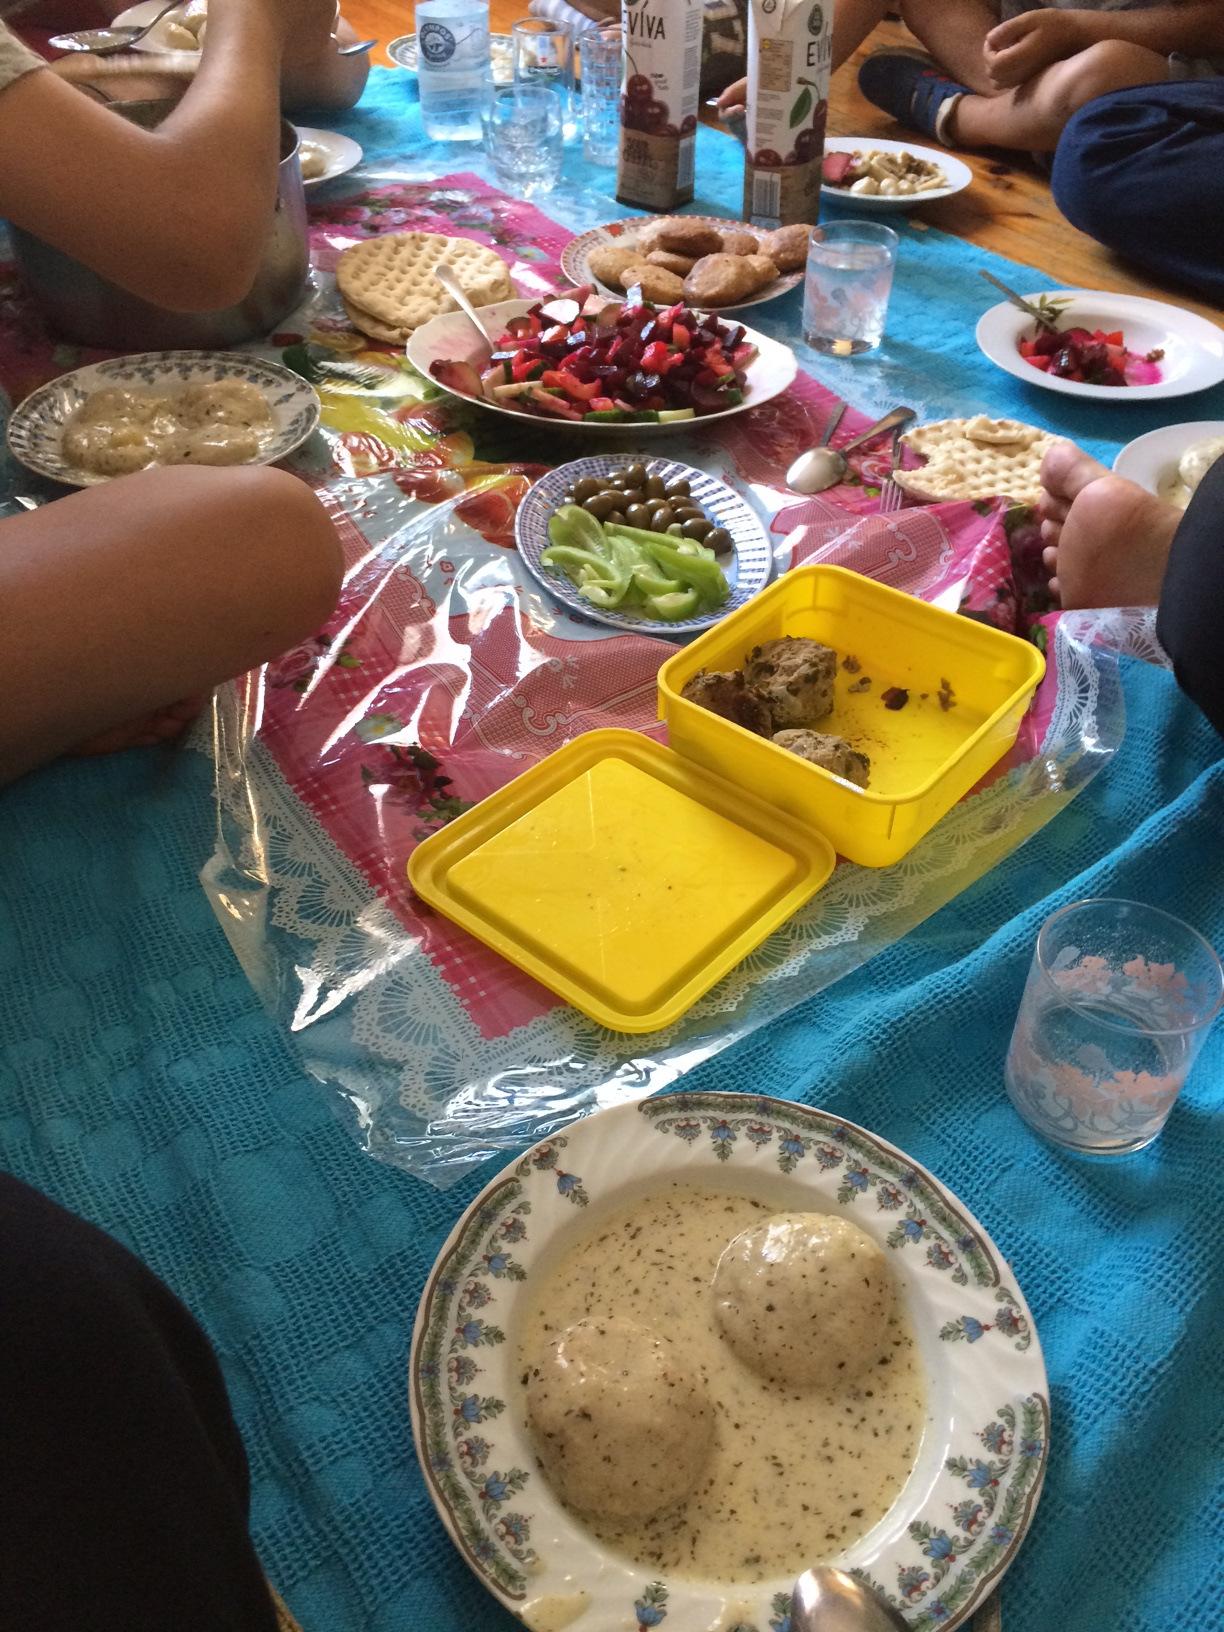 Building friendships by sharing an Iraqi specialty kofta bel ladin.